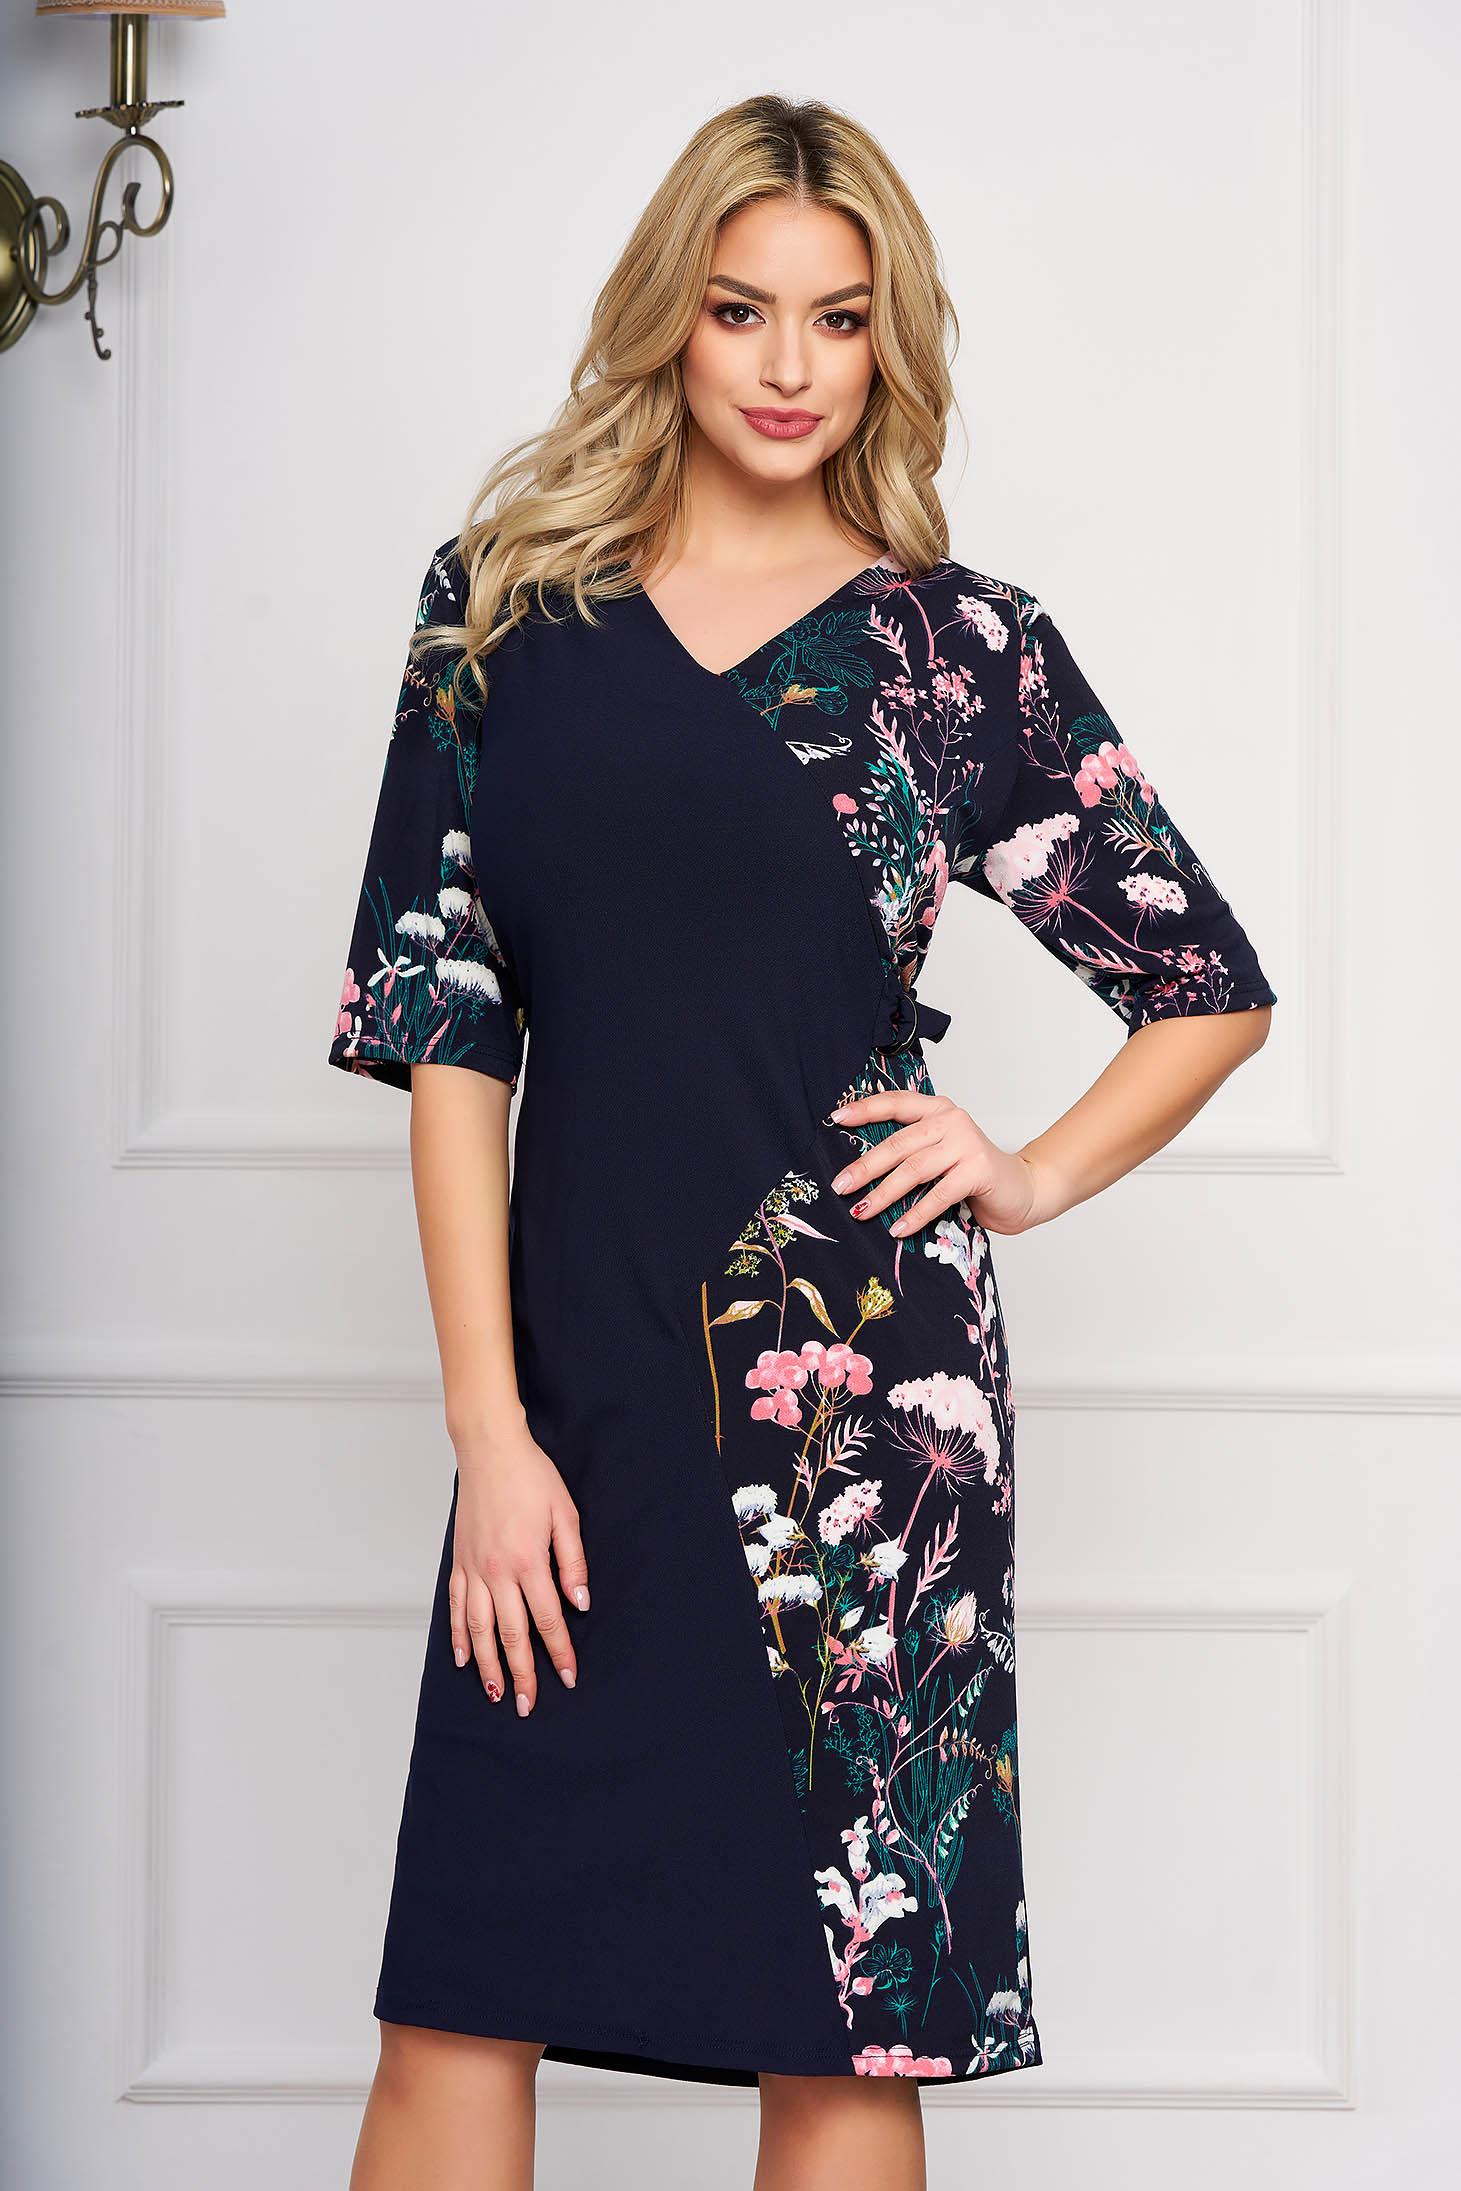 Darkblue dress with floral prints straight elegant midi cloth